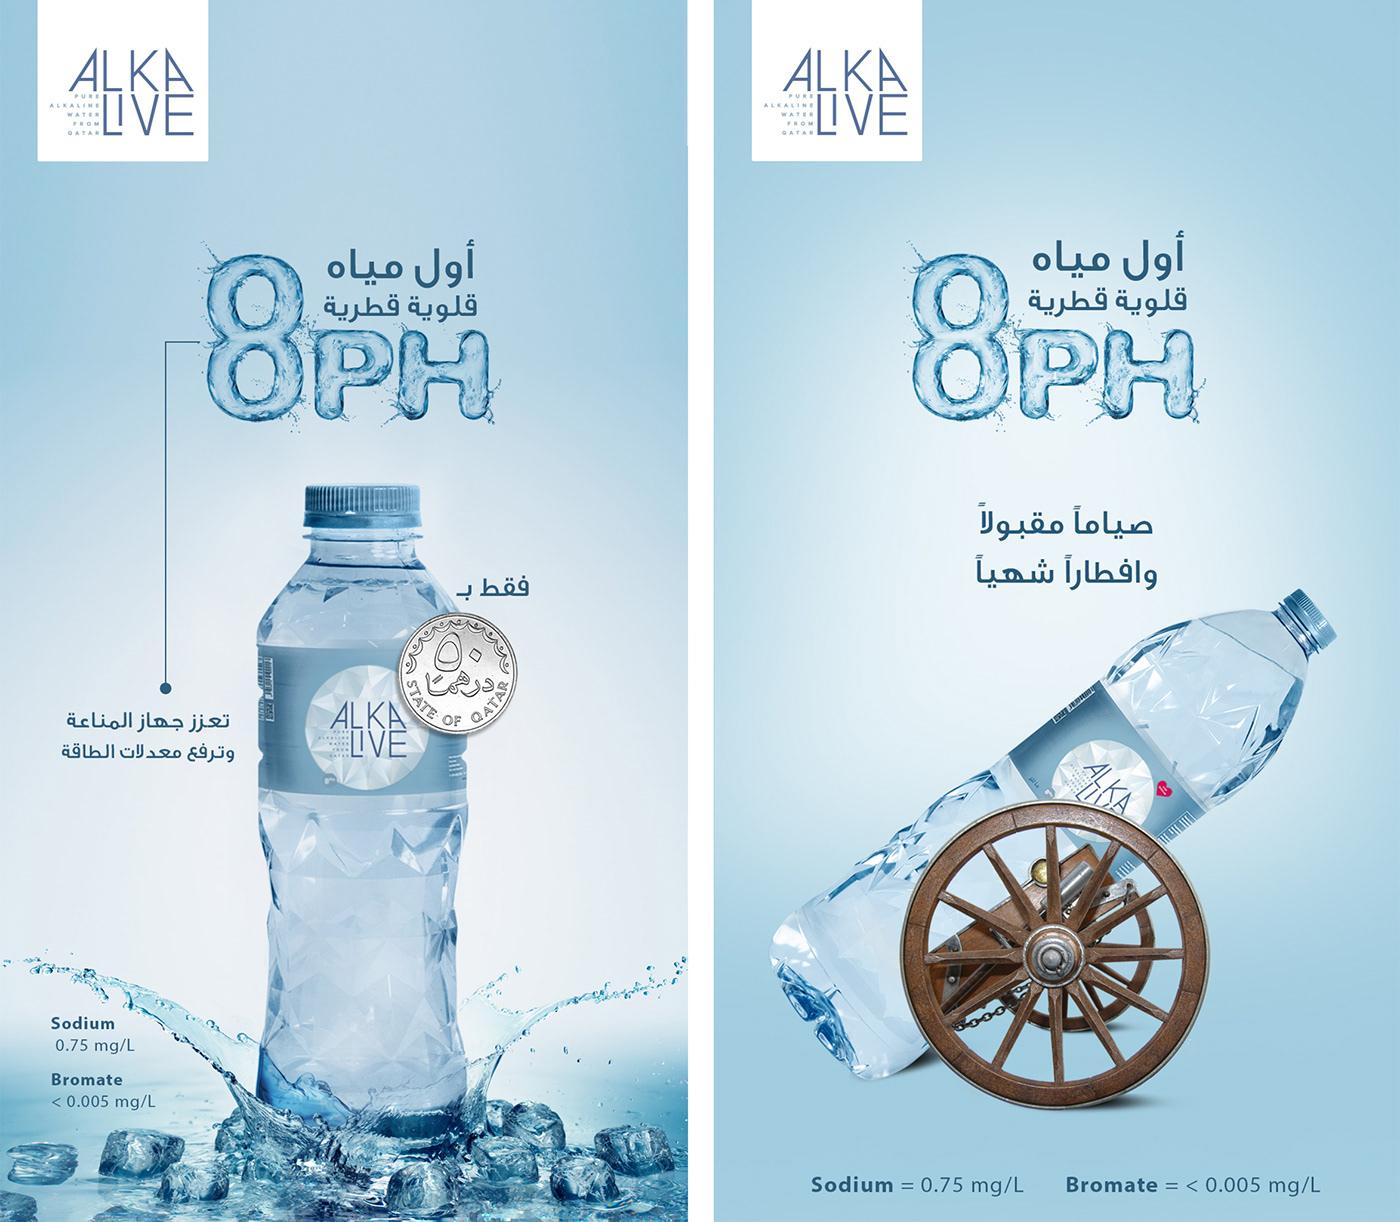 water ADV doha Qatar drink Alkaline